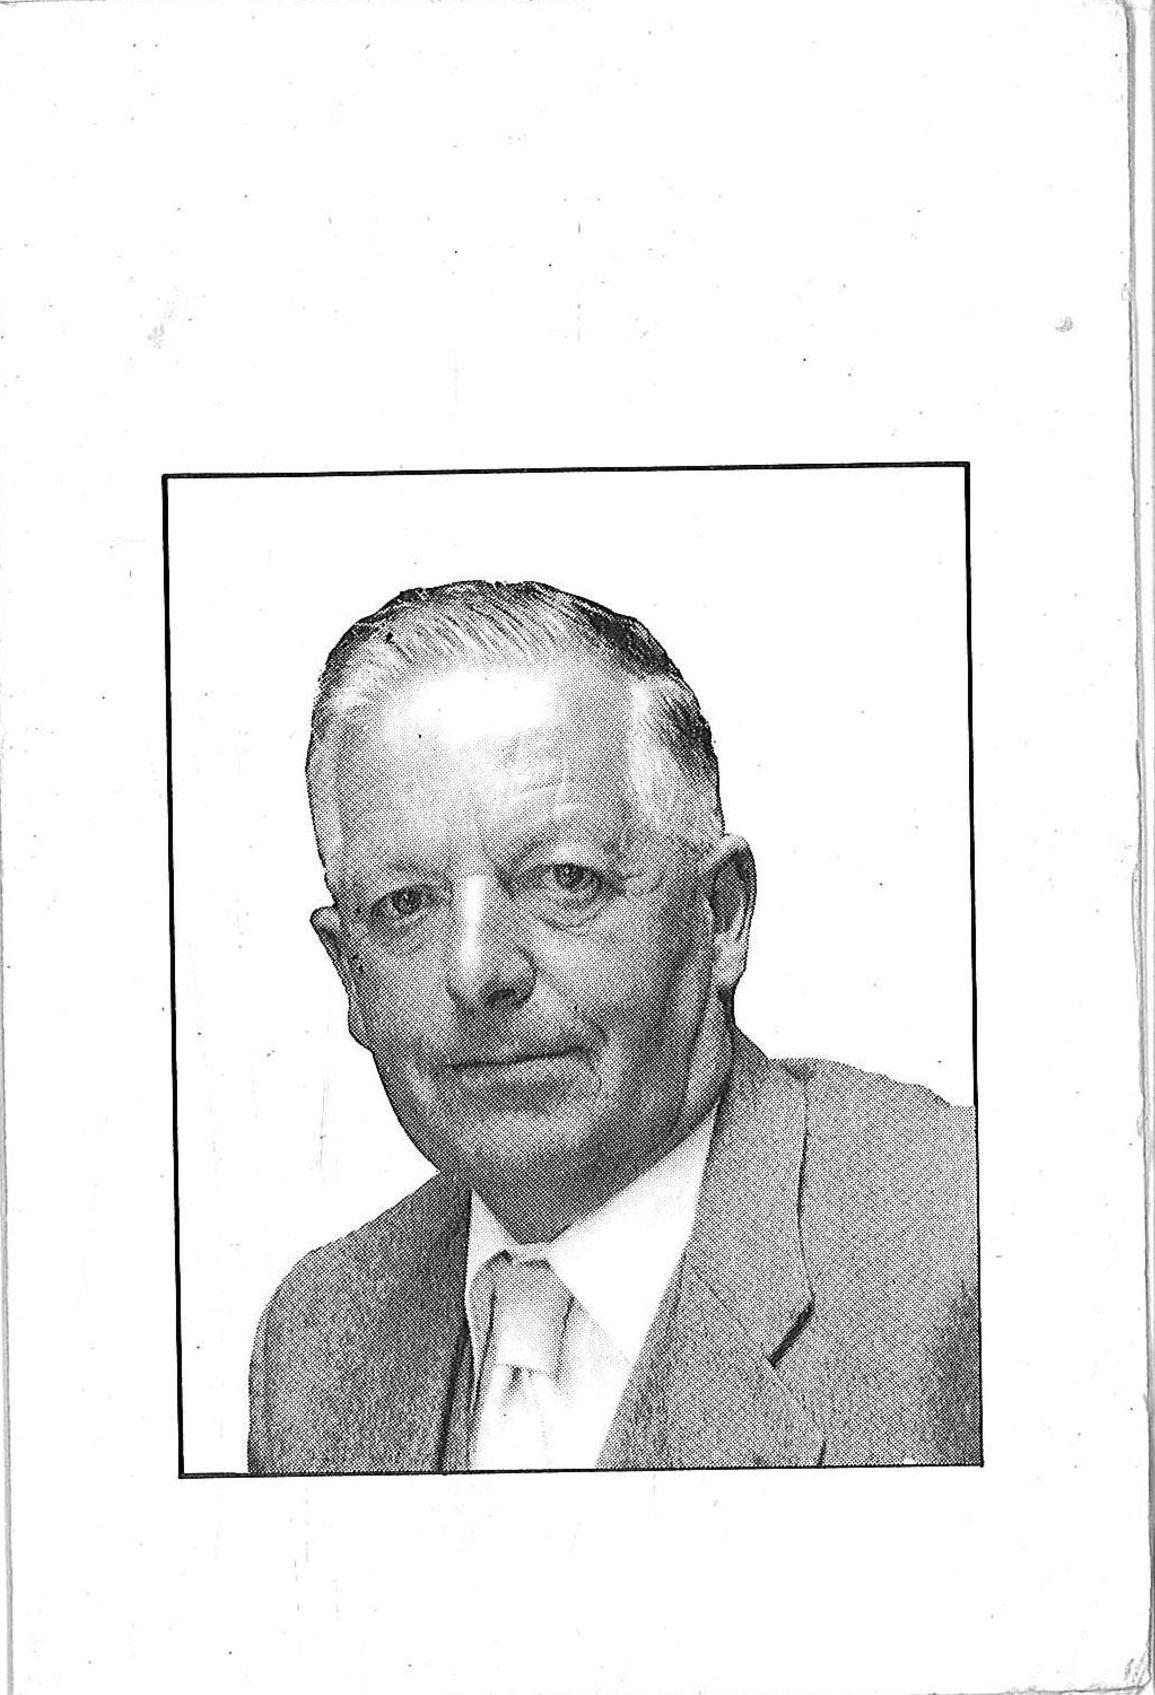 Albert-Andre Depauw